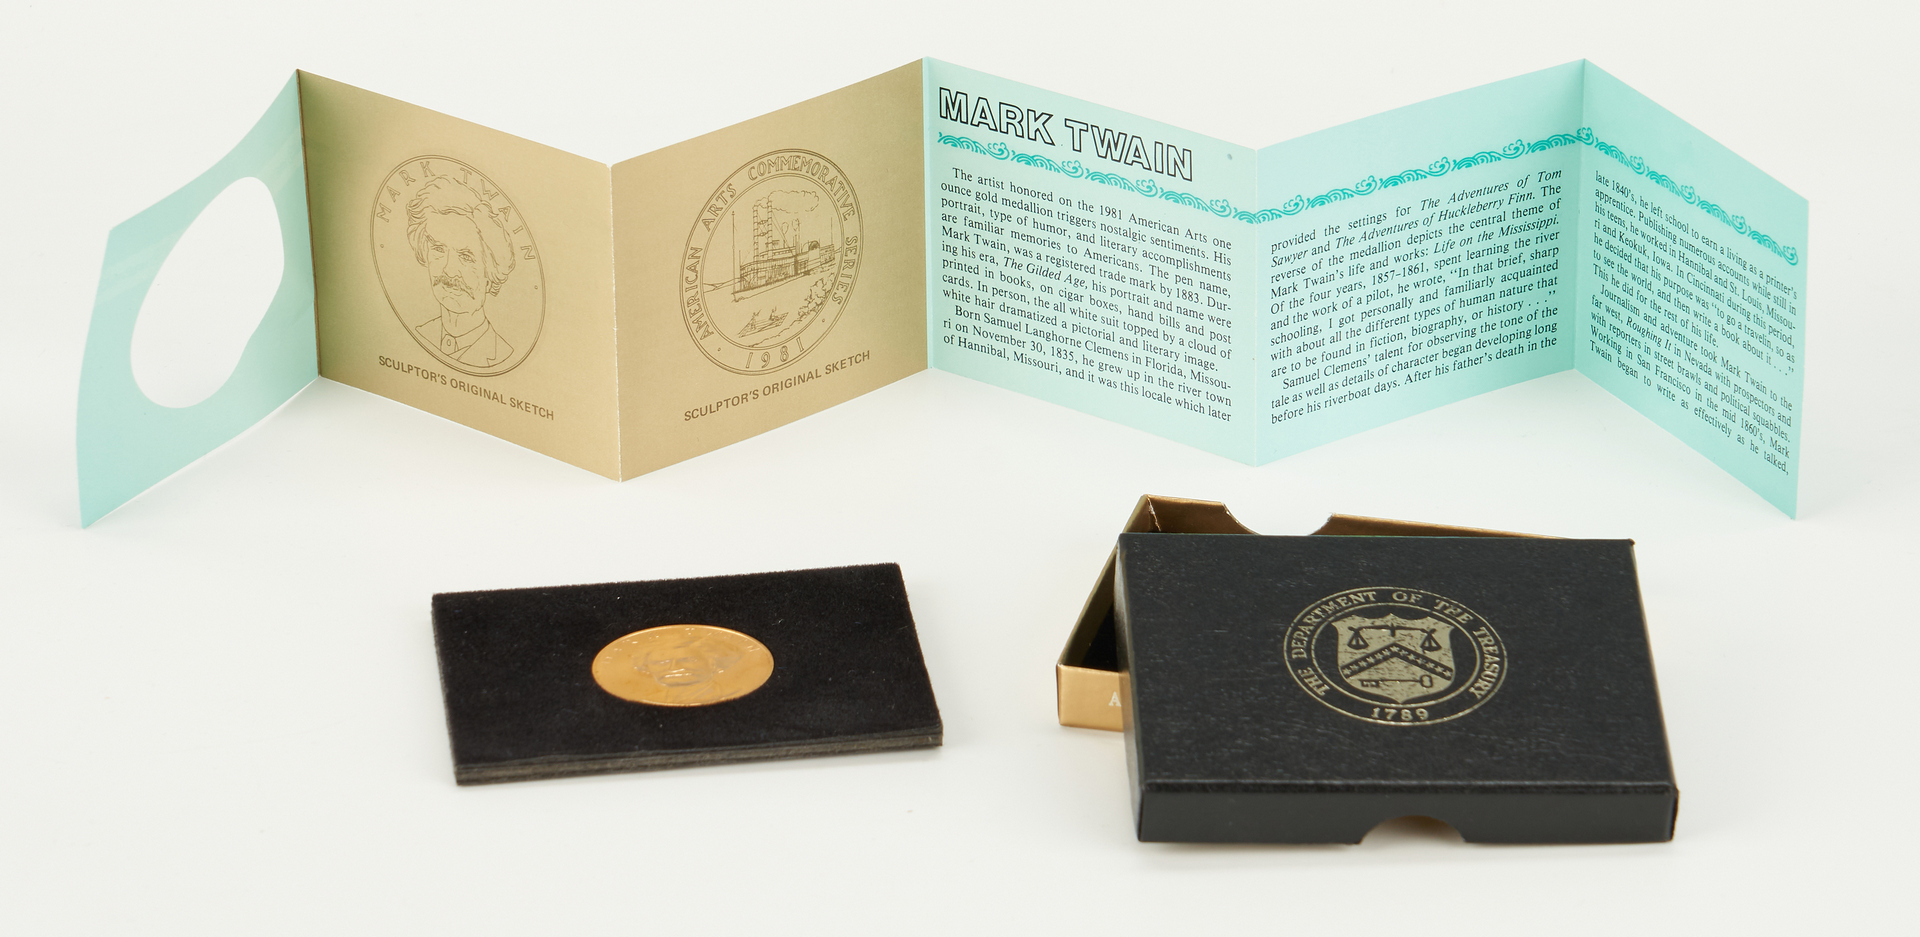 Lot 732: 1981 Mark Twain American Arts Gold Medallion